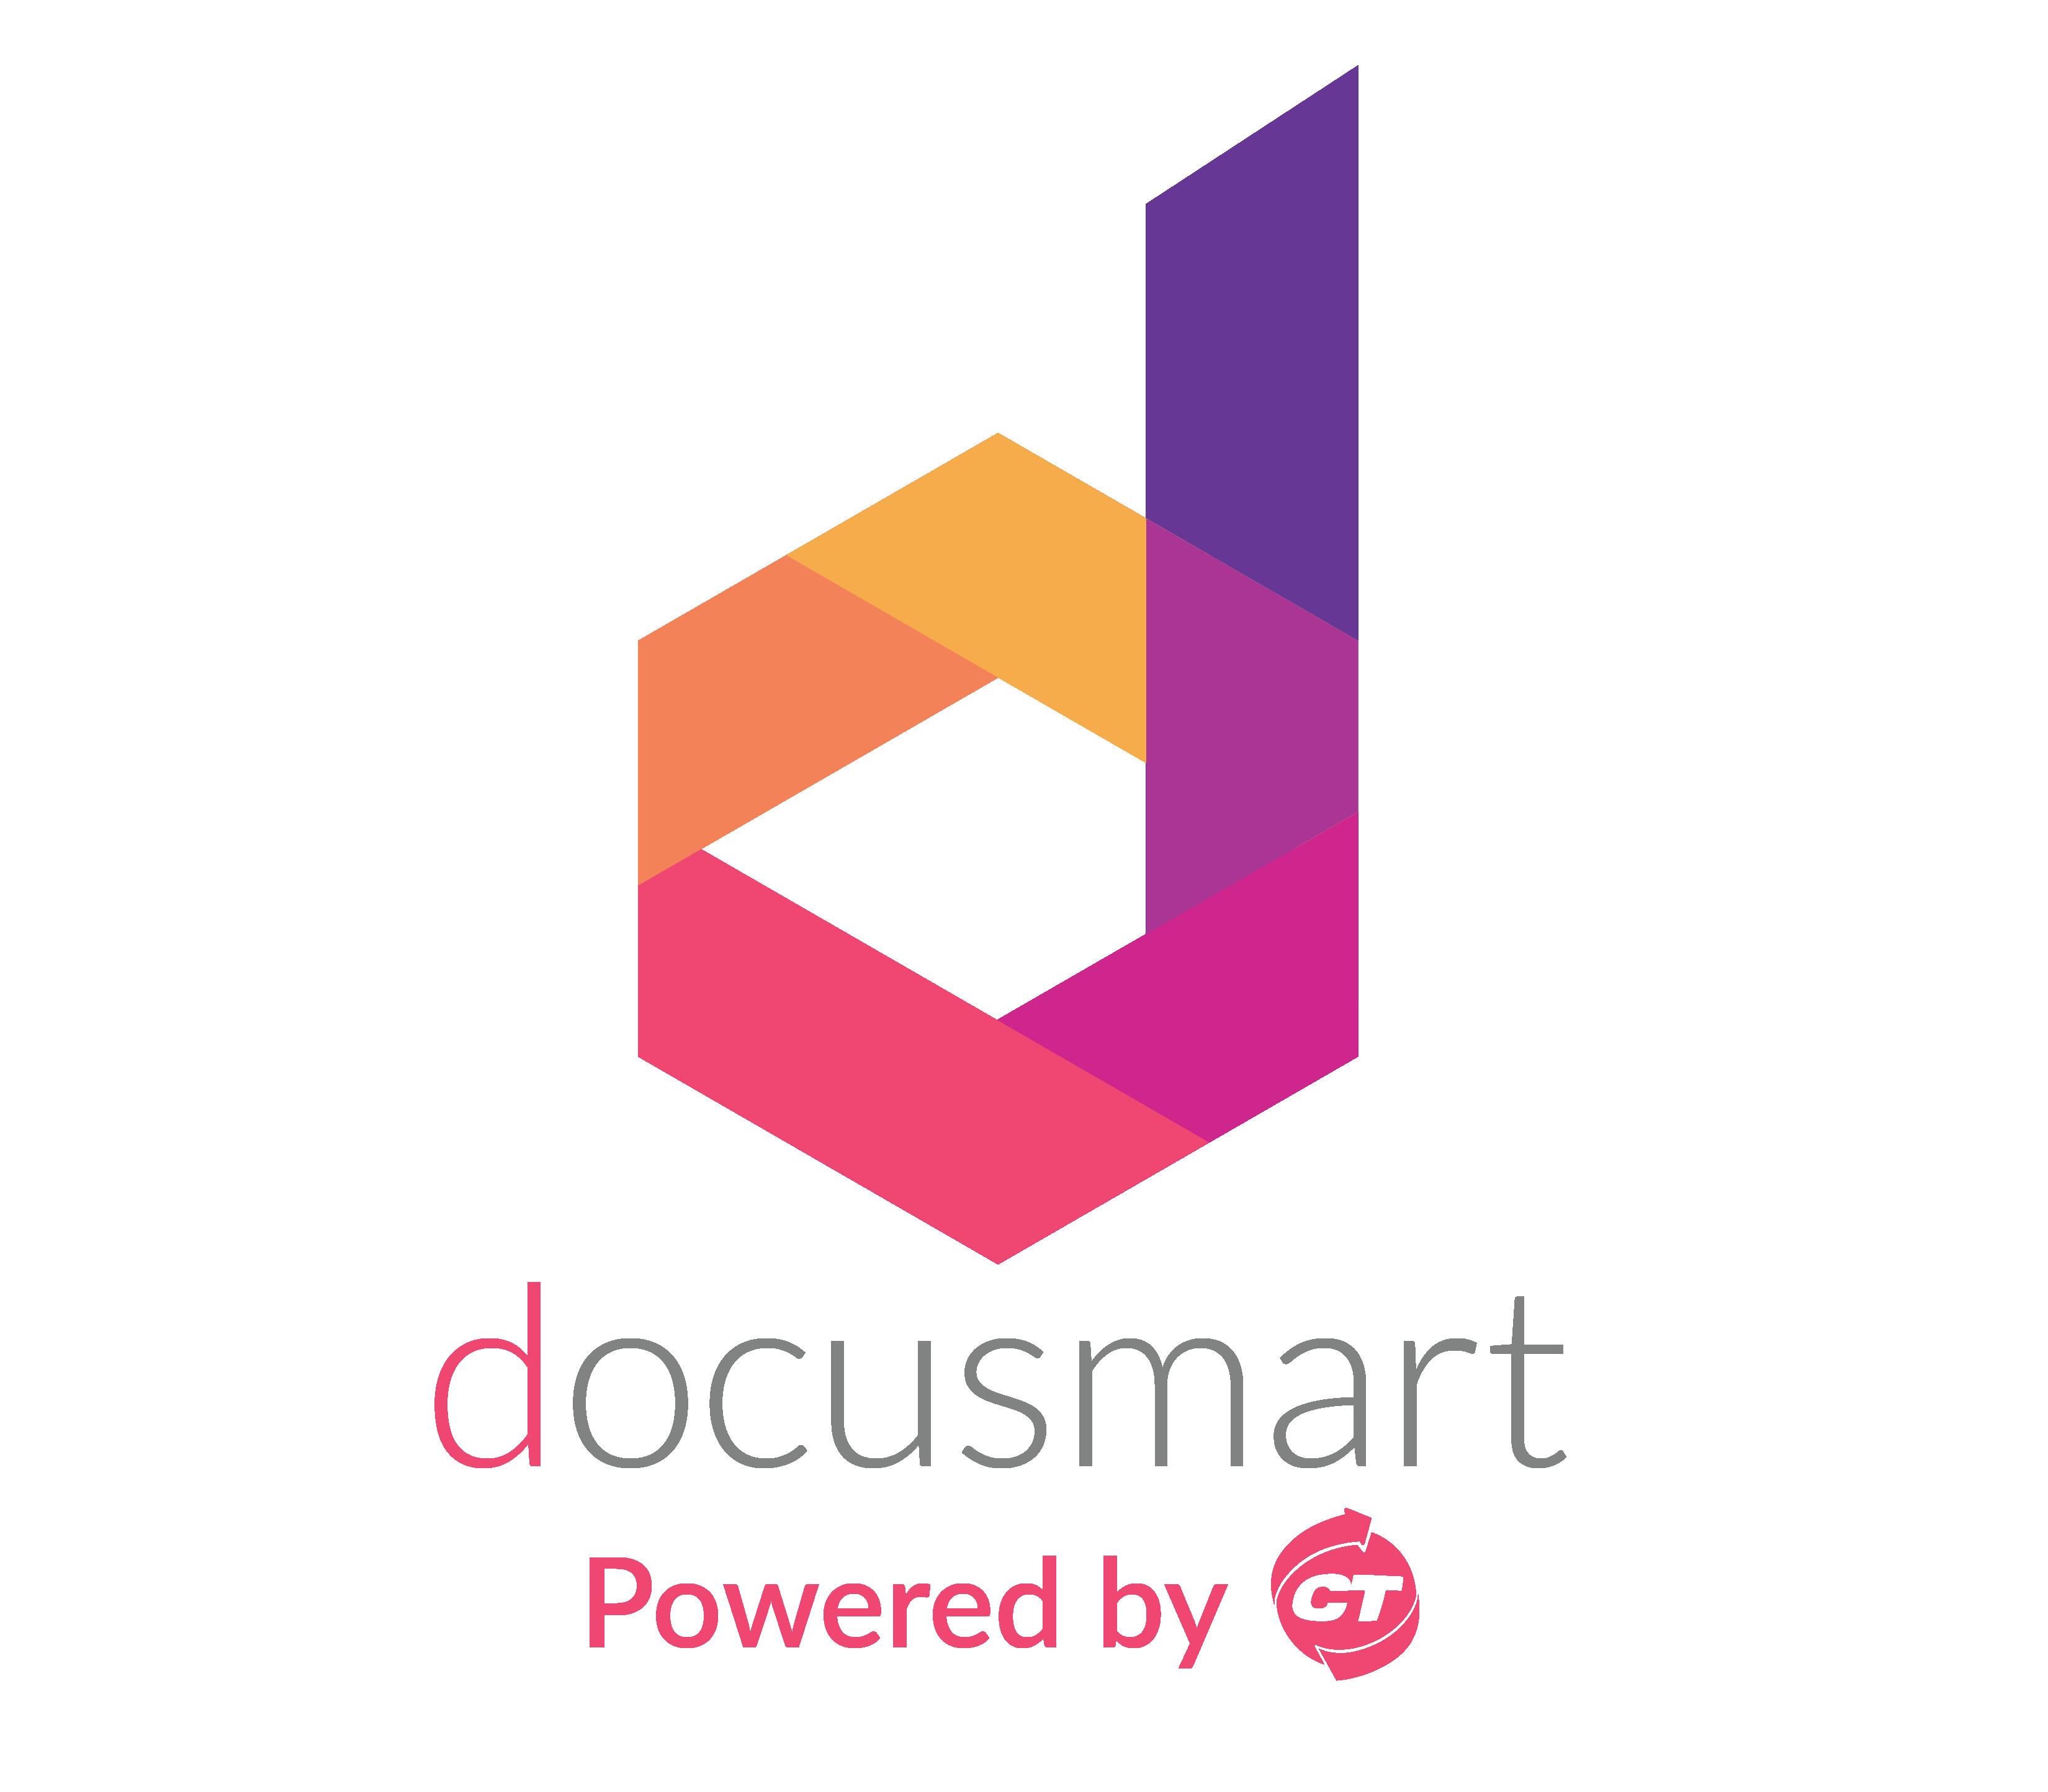 Docusmart